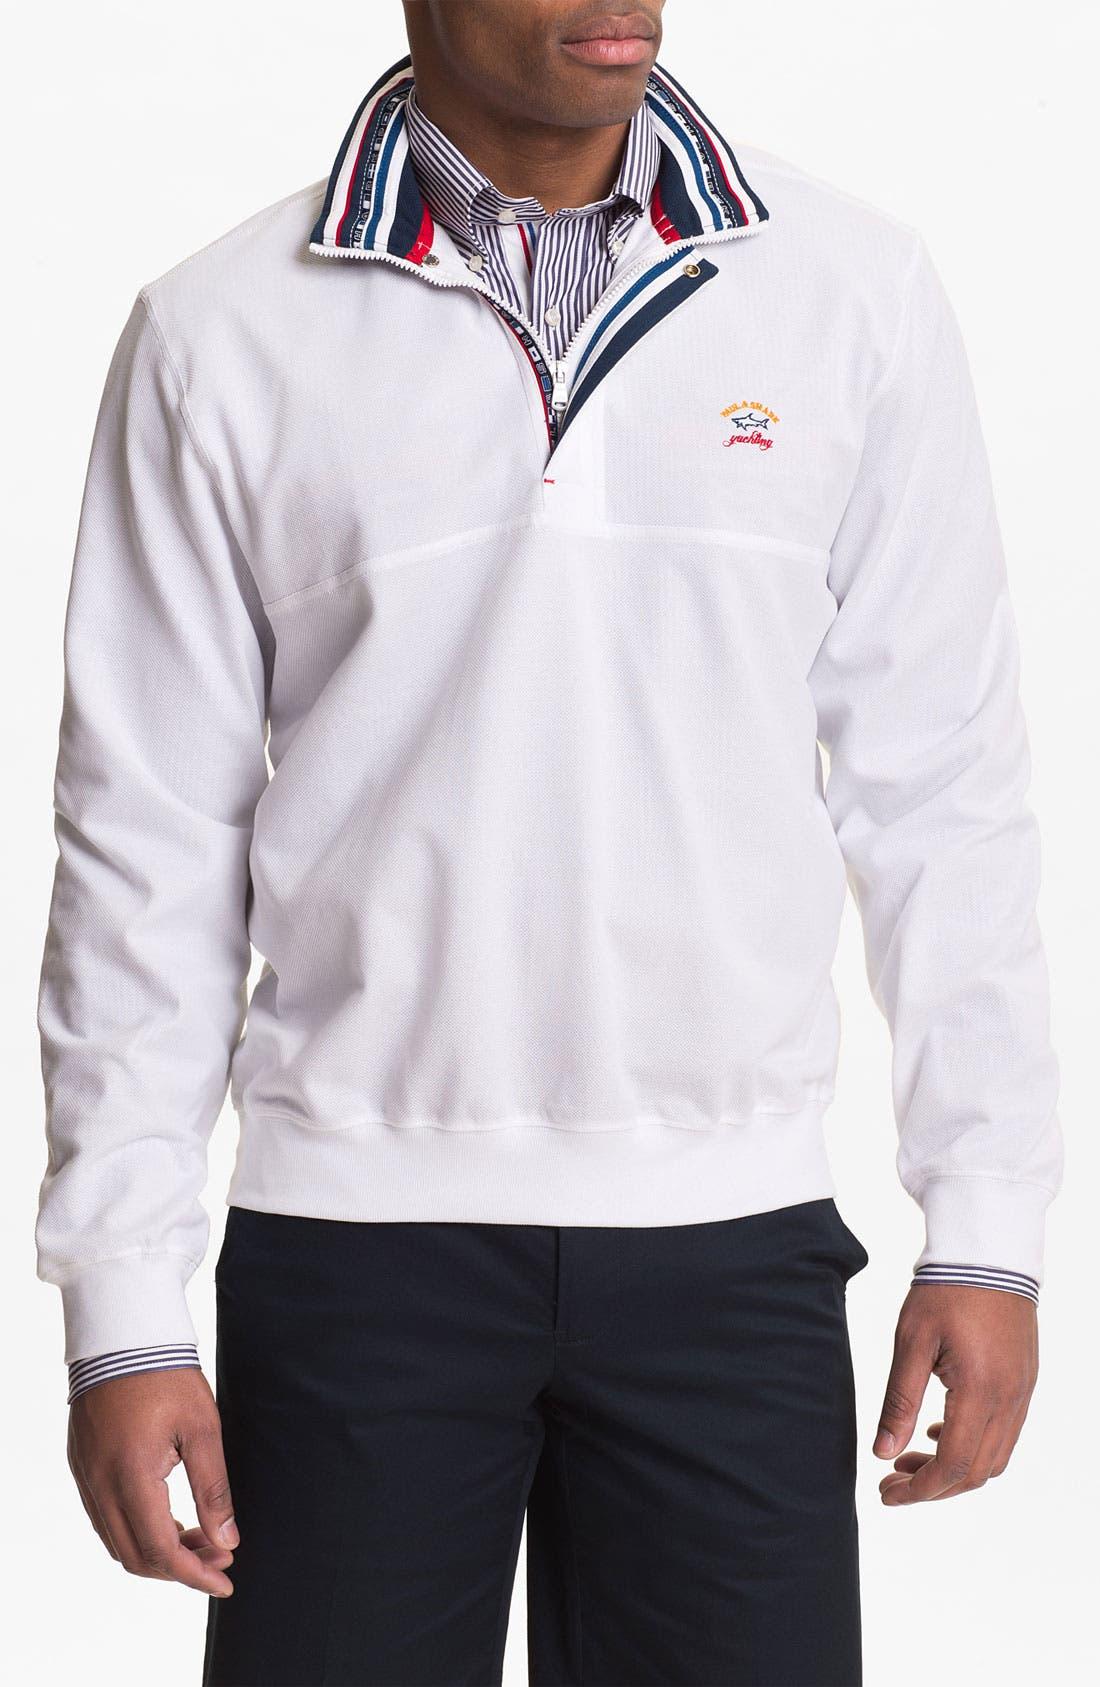 Main Image - Paul & Shark Quarter Zip Pique Sweater